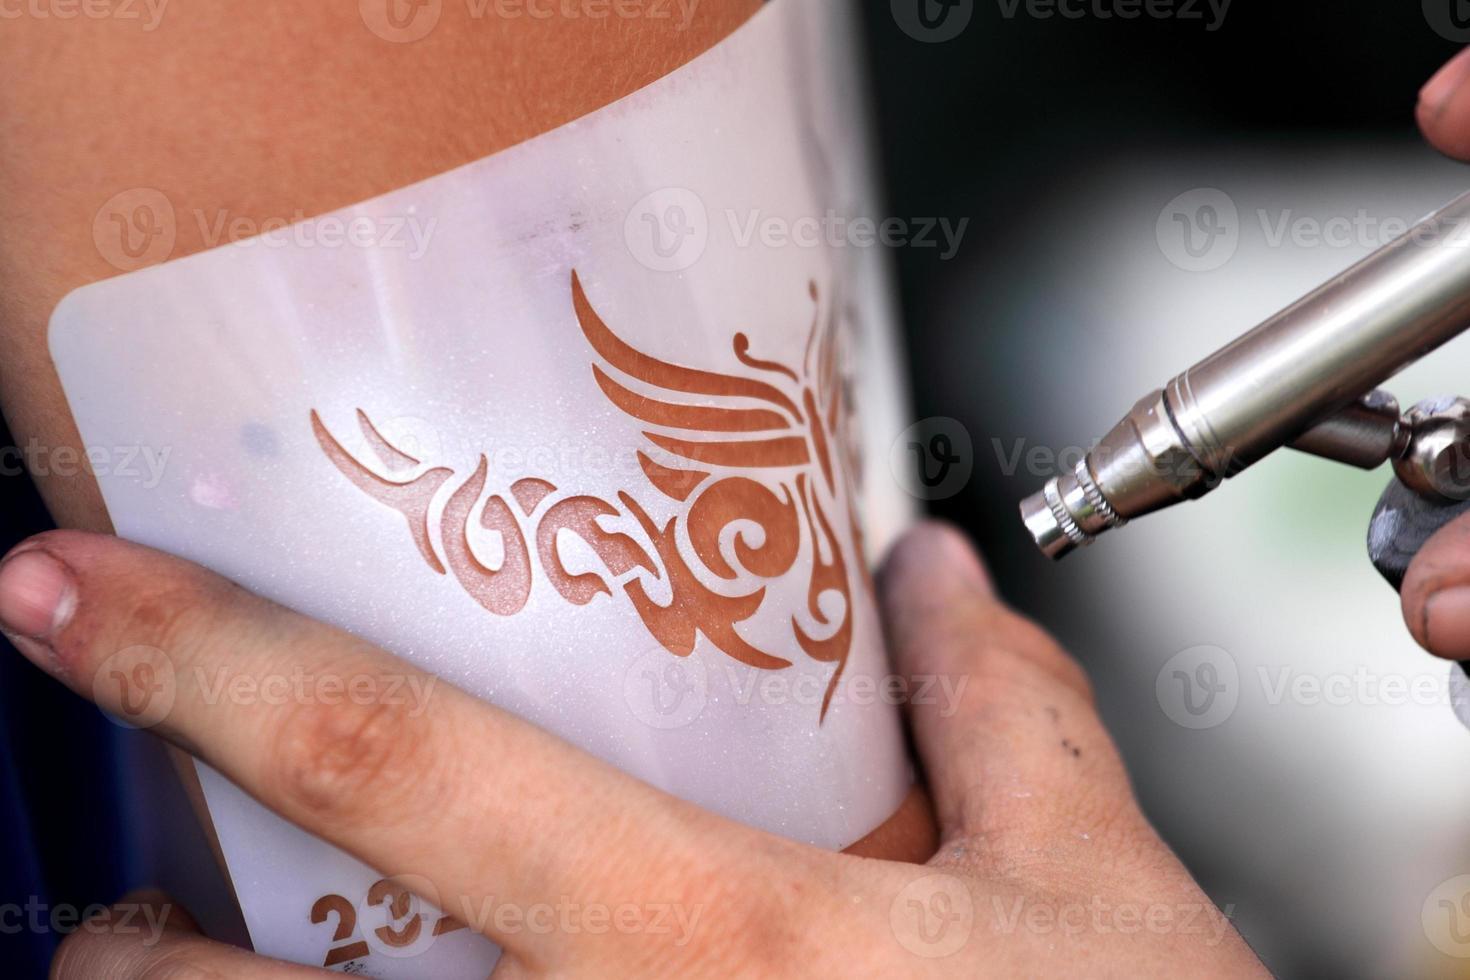 luftborste tatuering foto